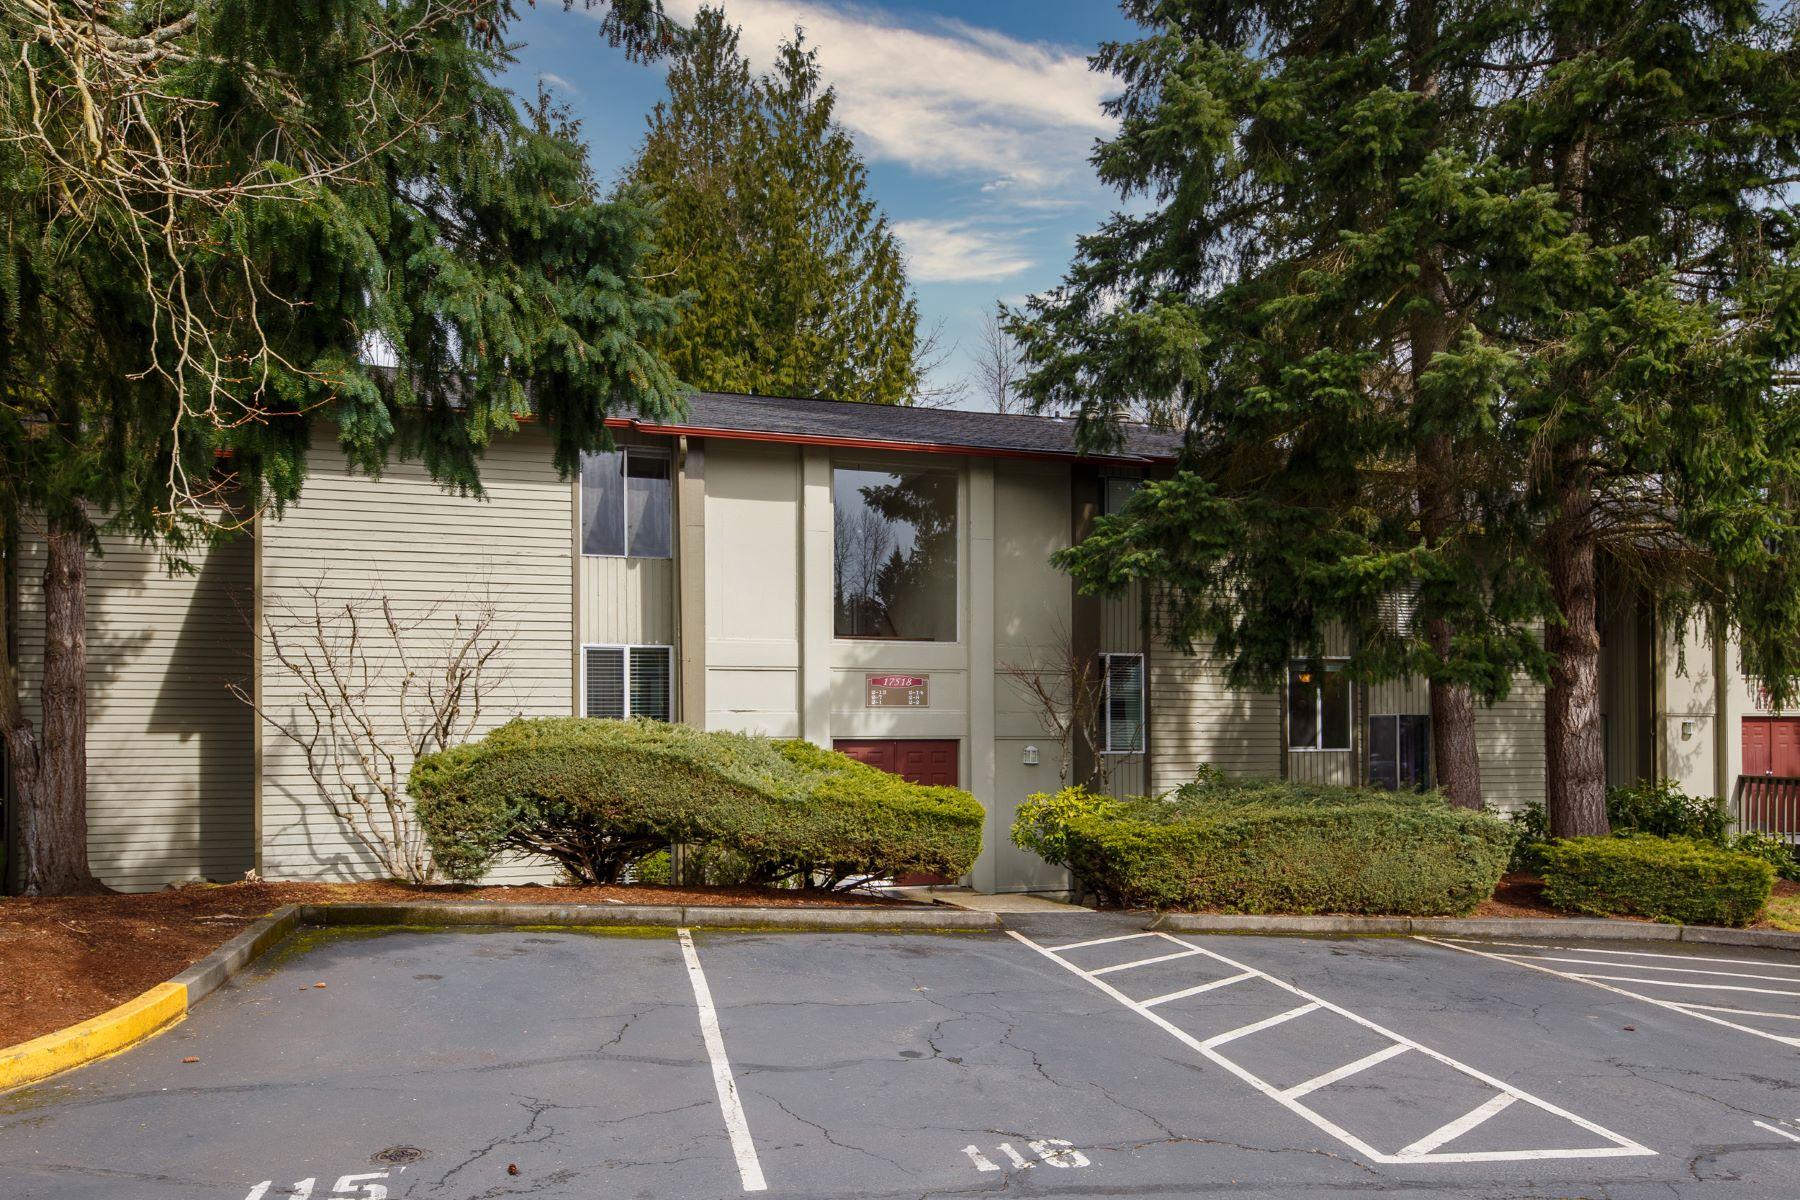 Condominiums 용 매매 에 Tranquil Fairwood Community Living 17518 151st Ave SE Unit #2-8 Renton, 워싱톤 98058 미국